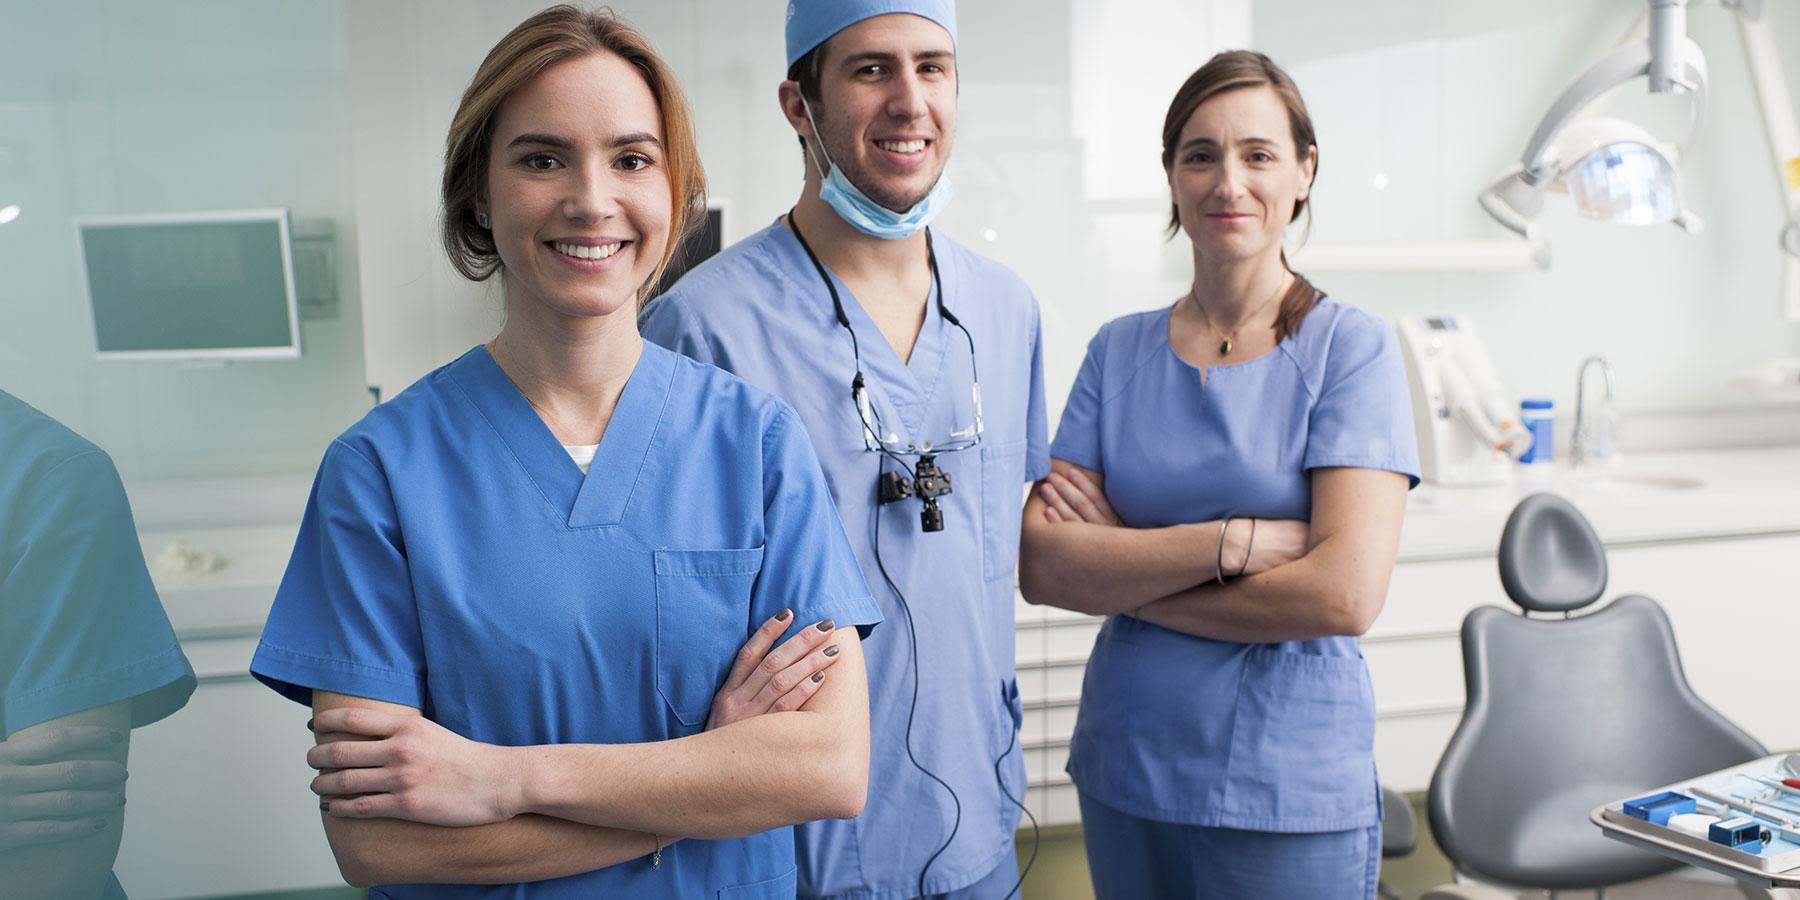 dental practice in saginaw